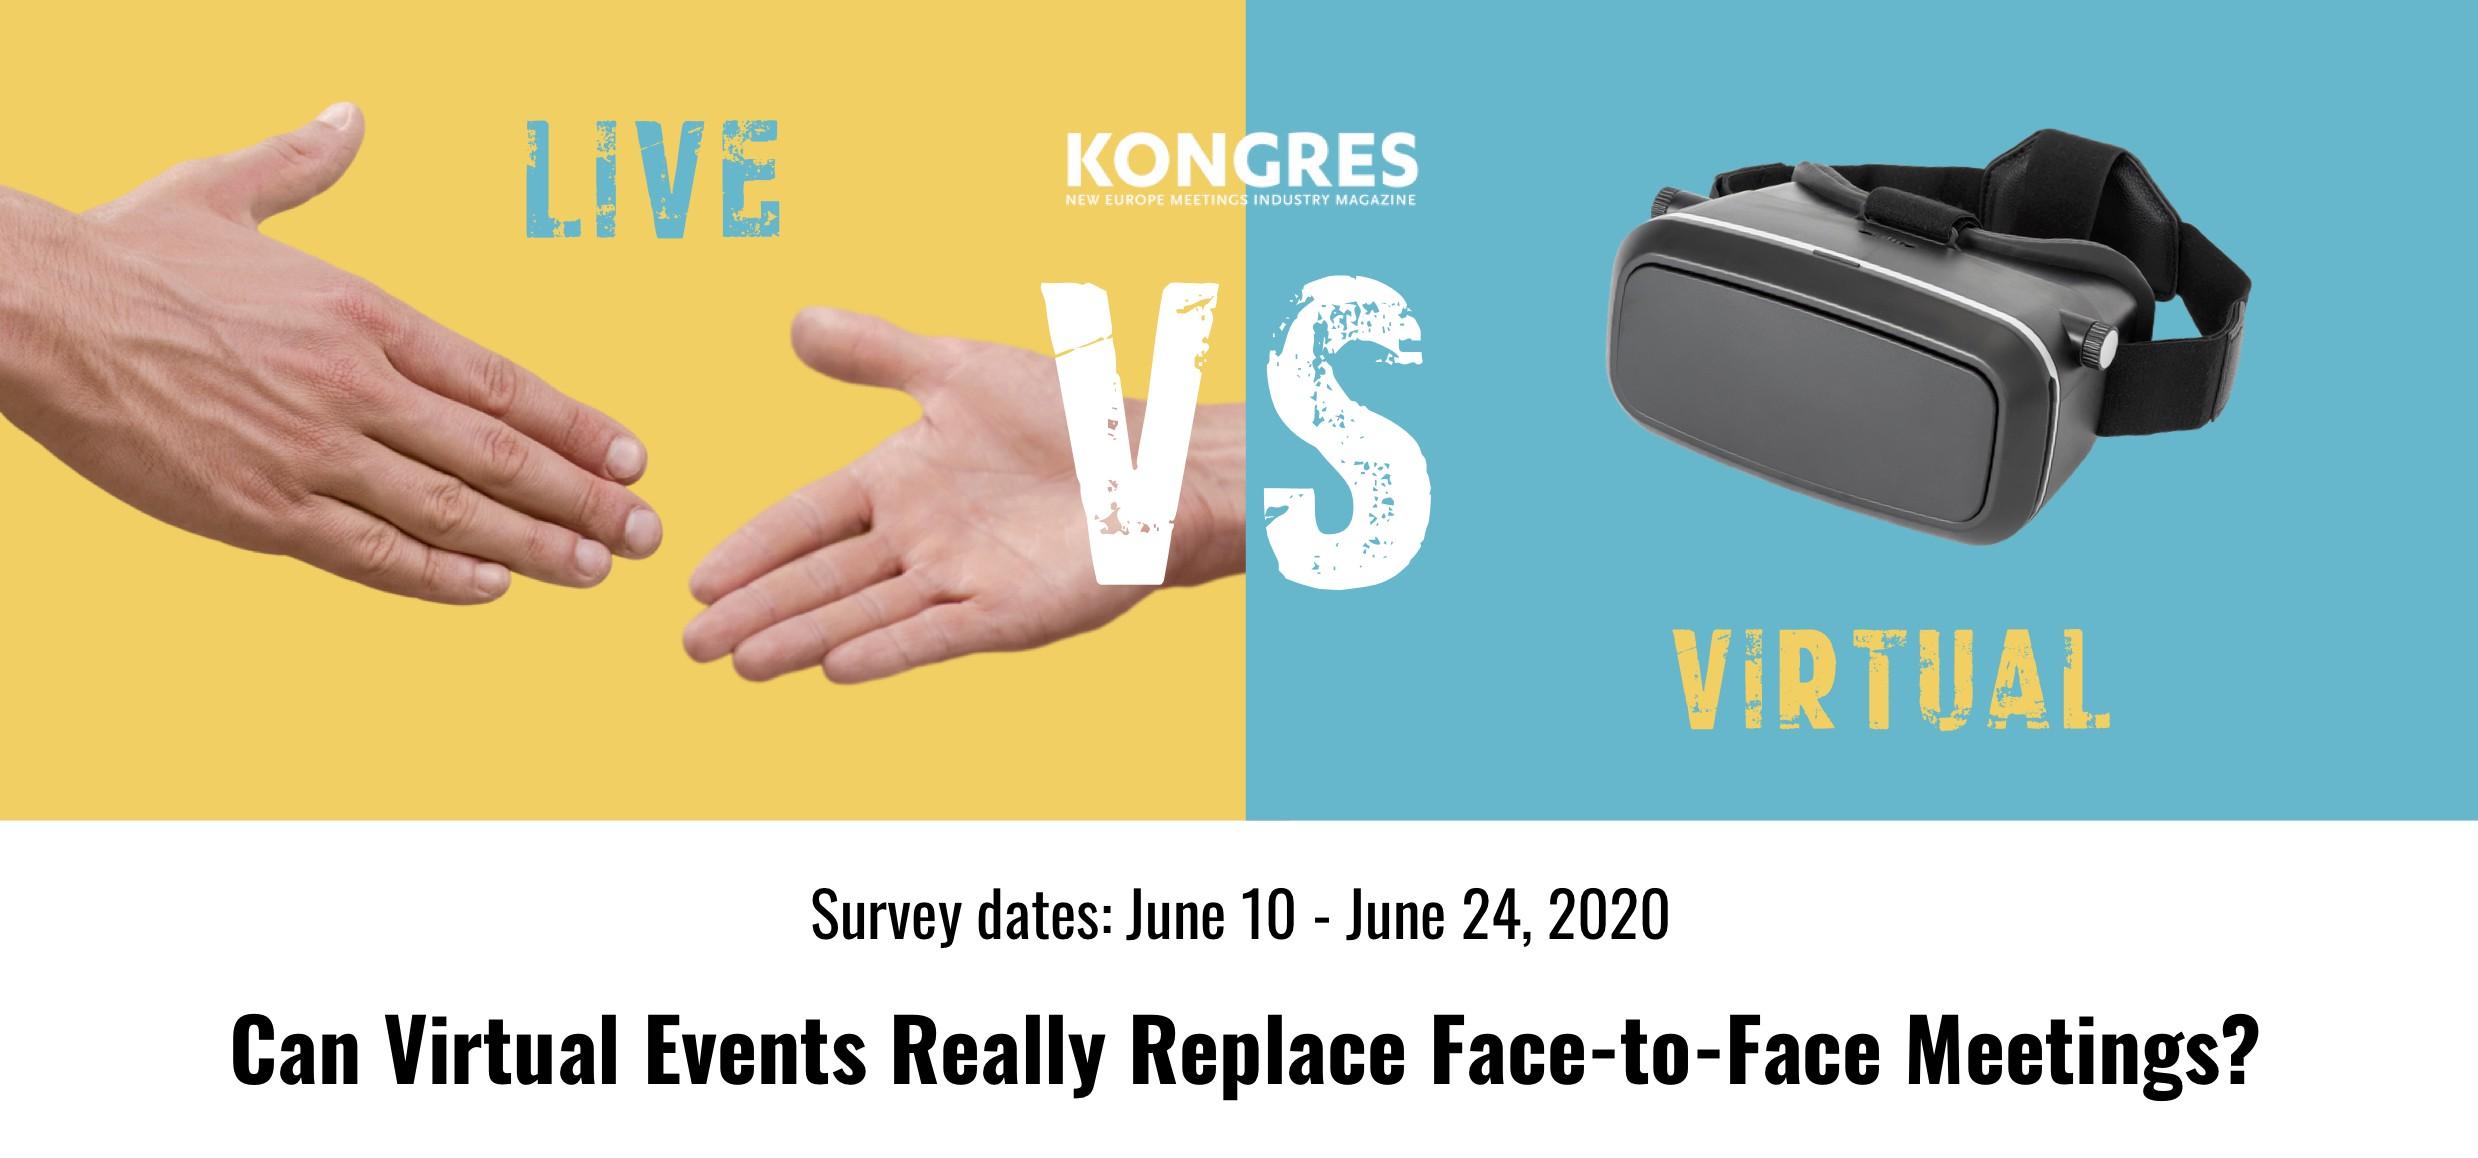 kongres-magazine-virtual-live